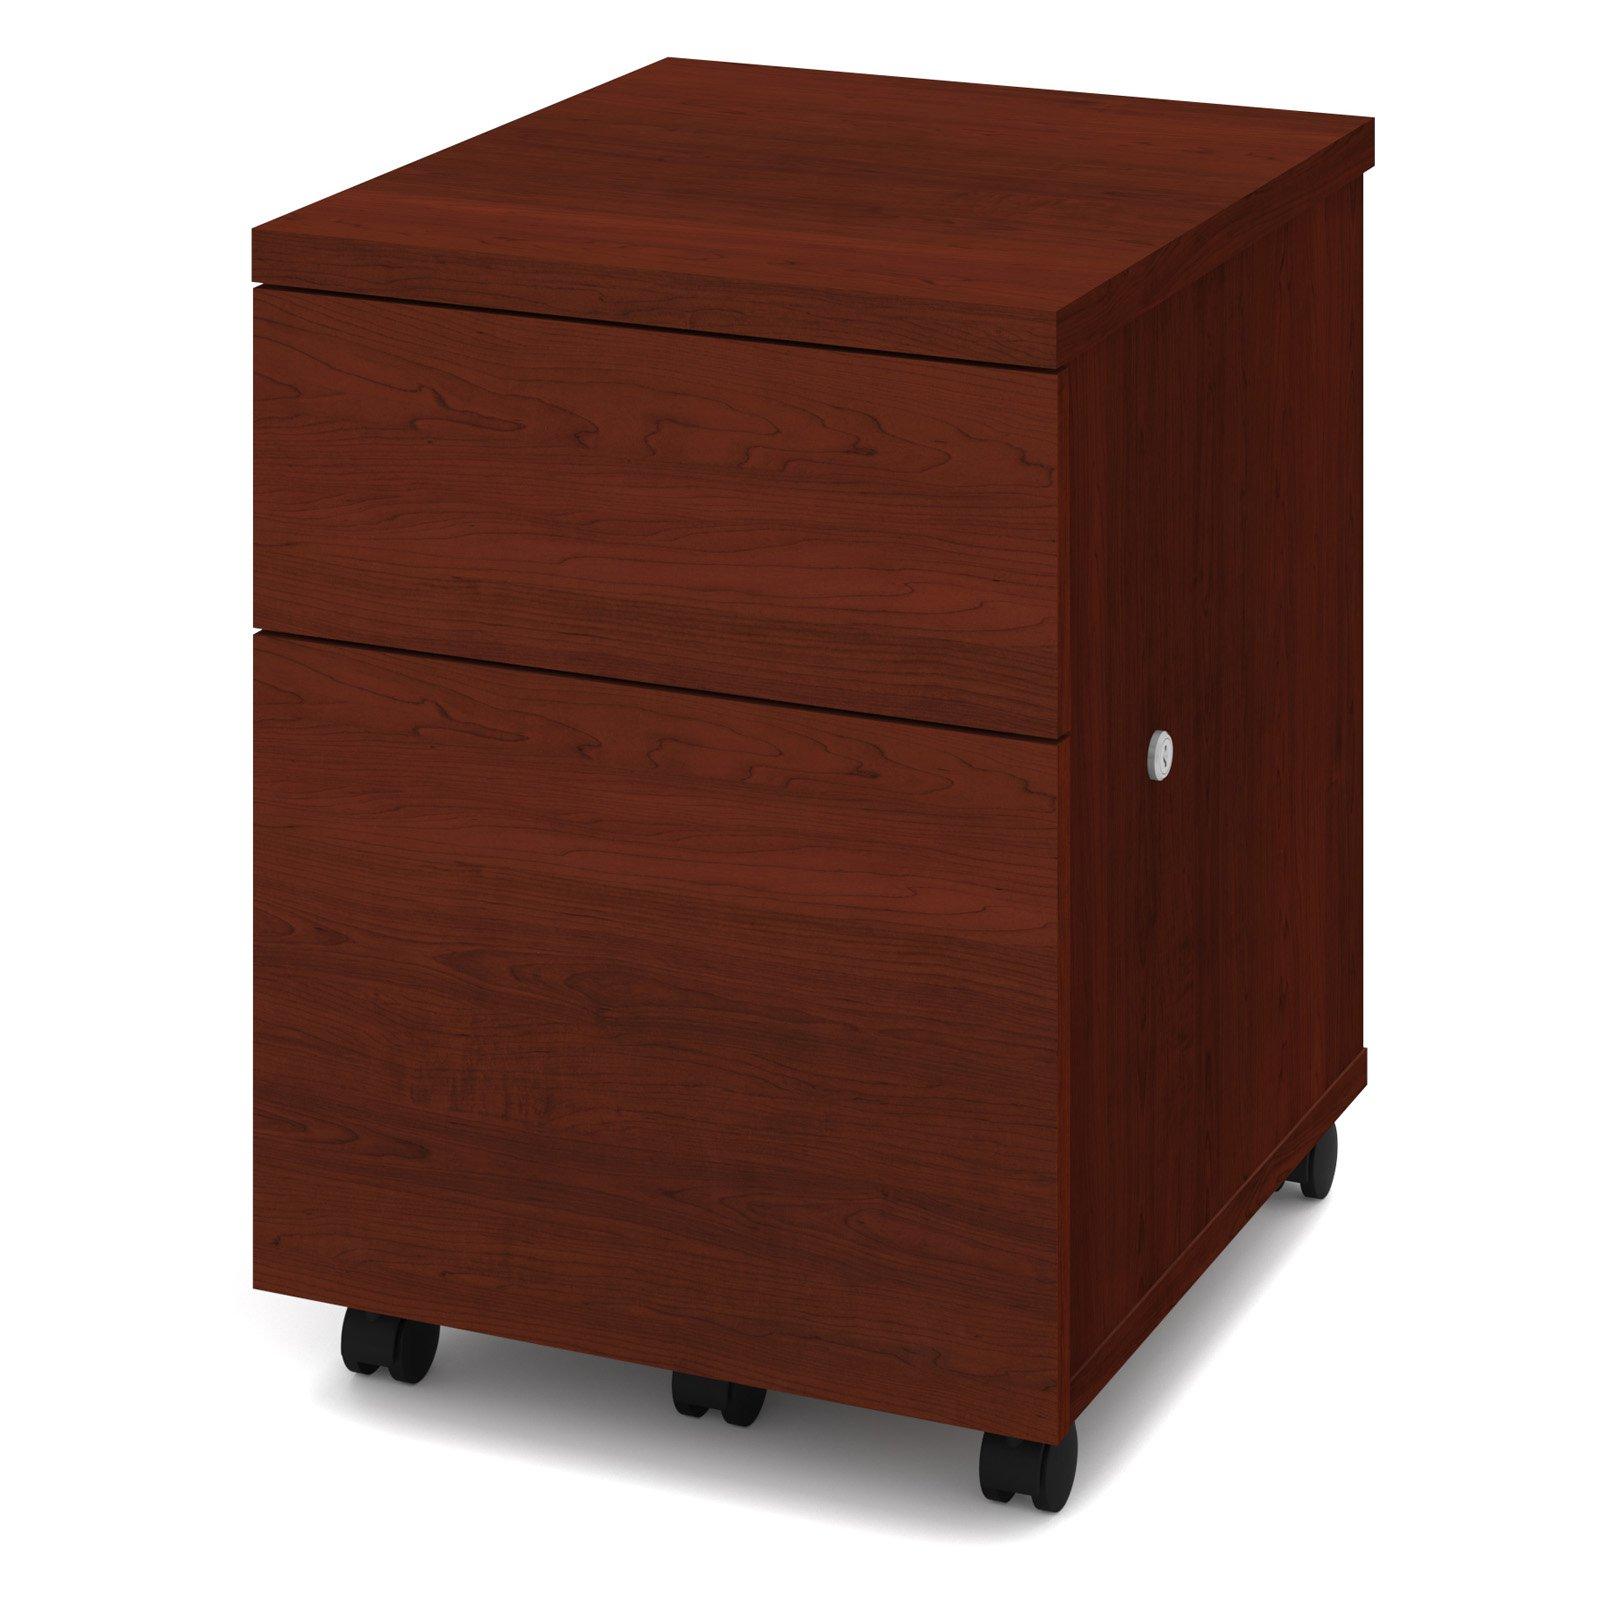 Bestar 1u1f Mobile Pedestal File Cabinet Products In 2019